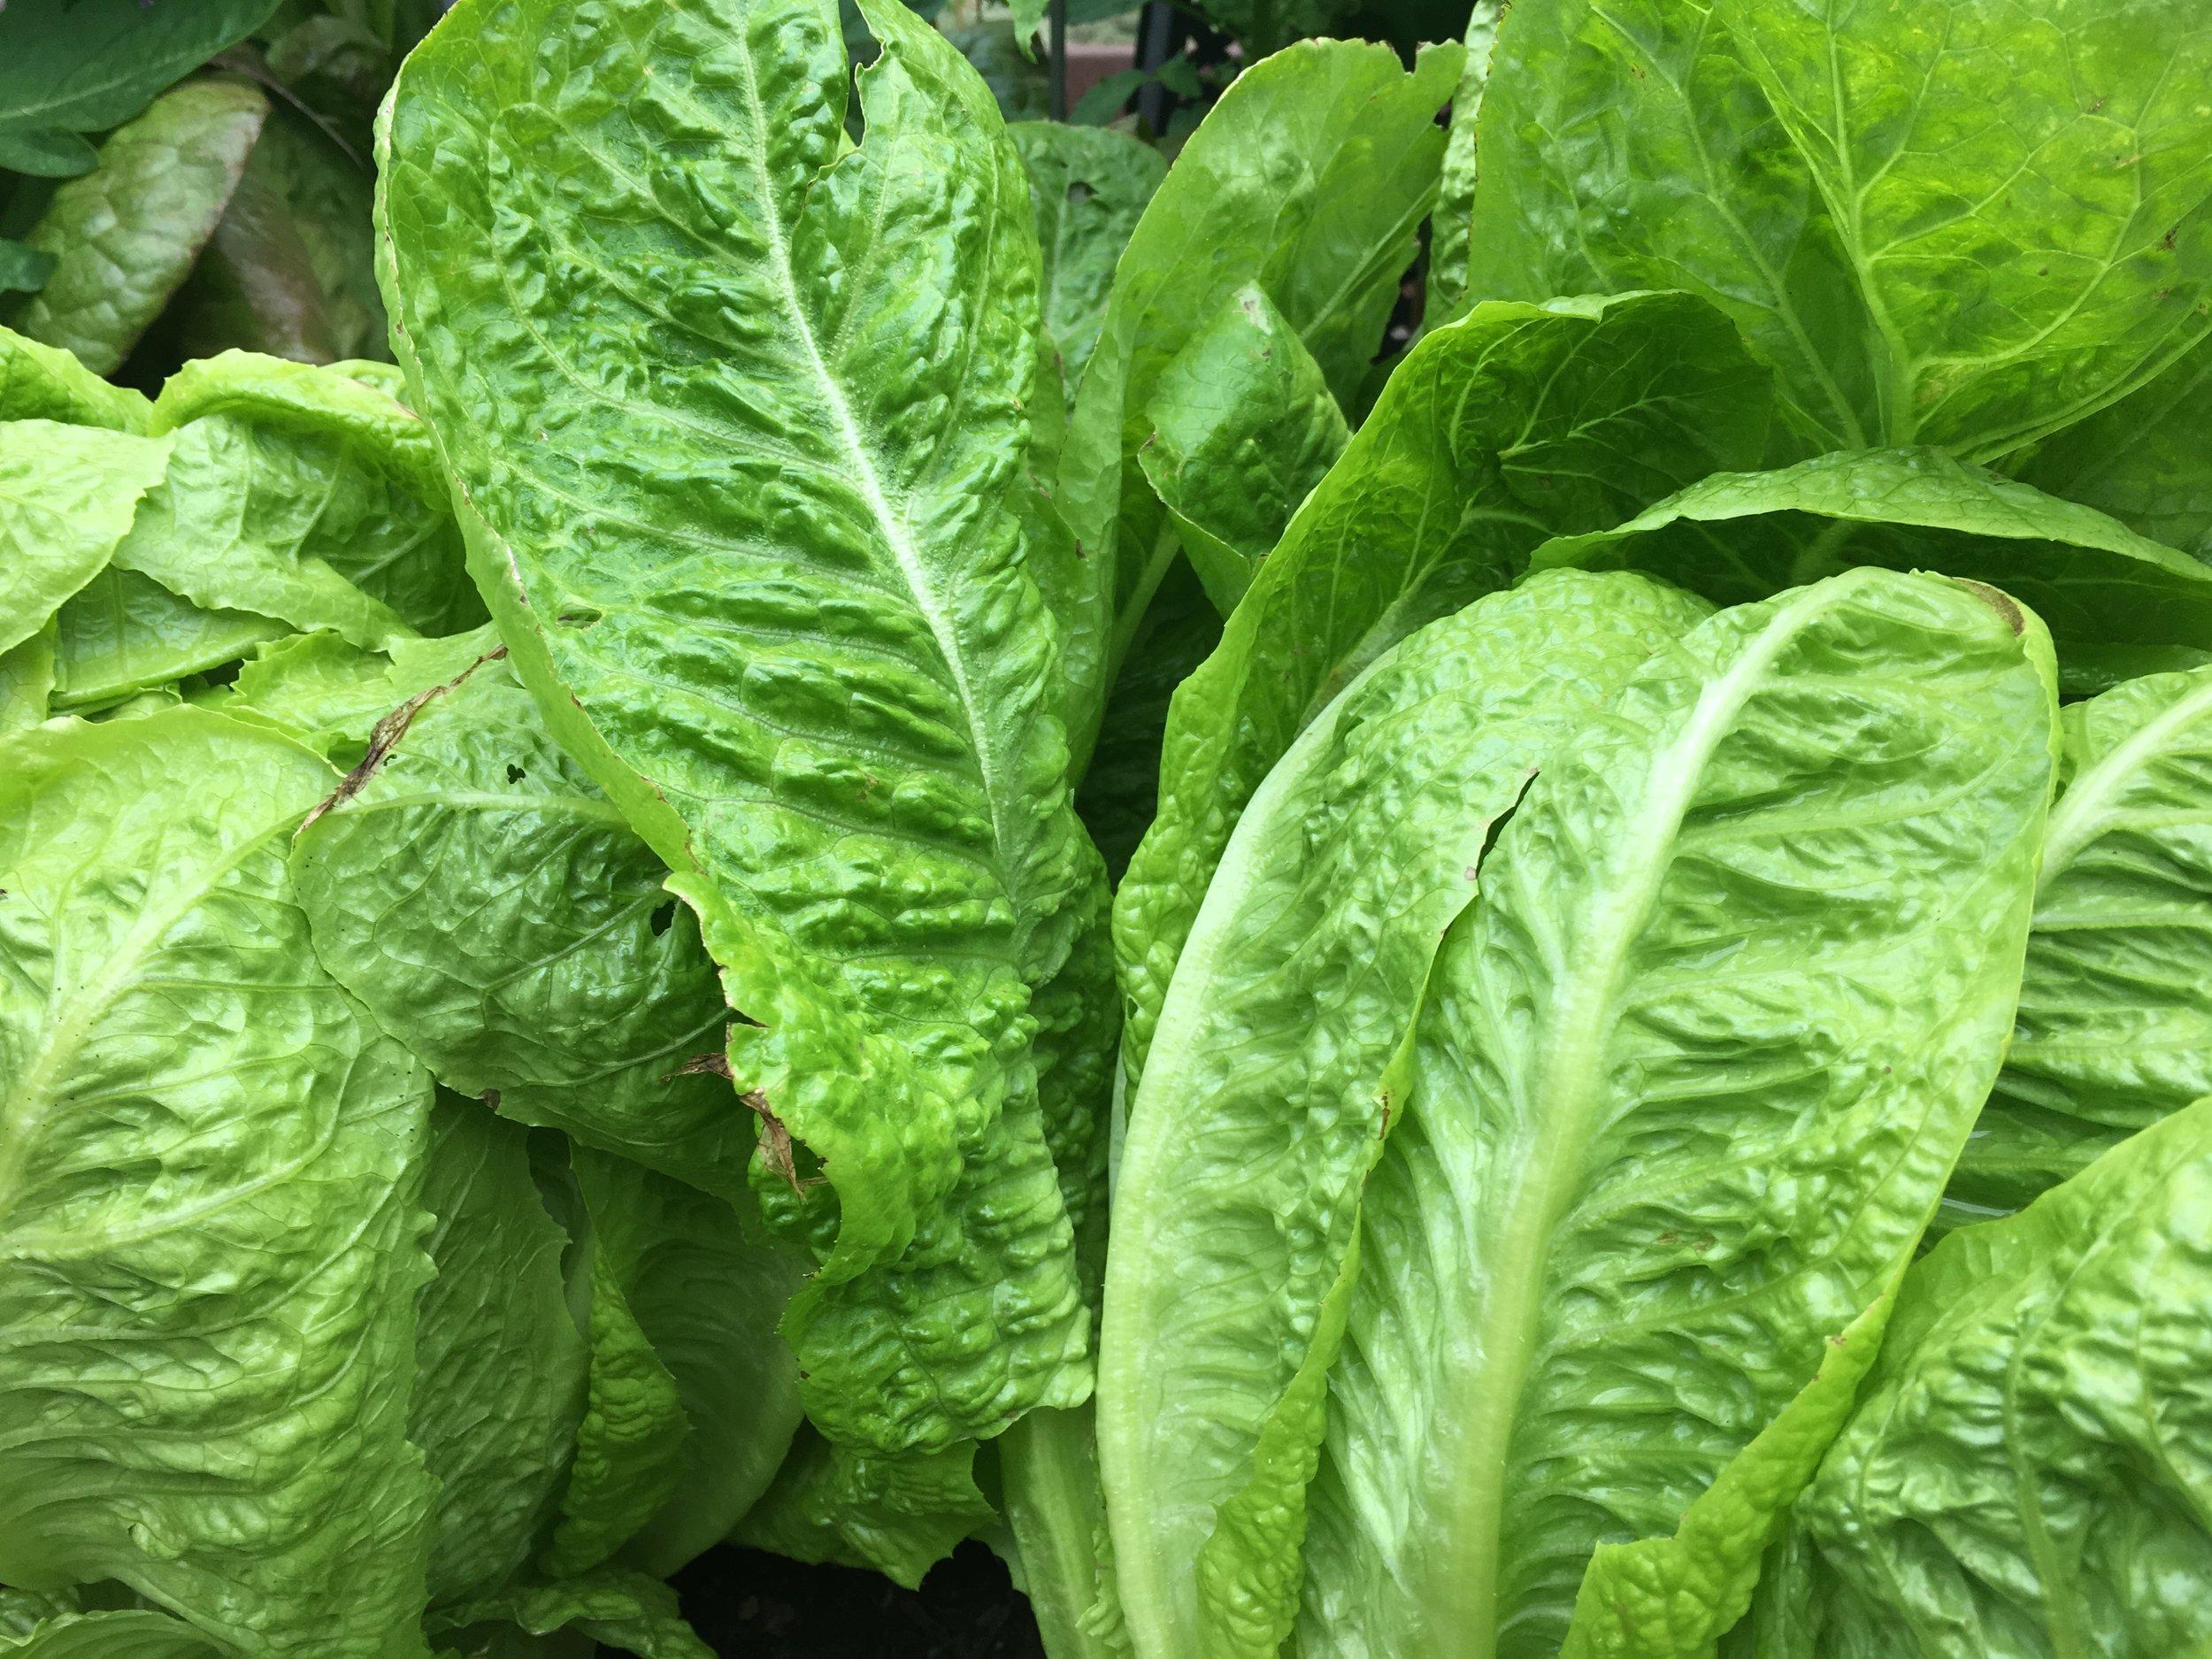 'Jericho' lettuce